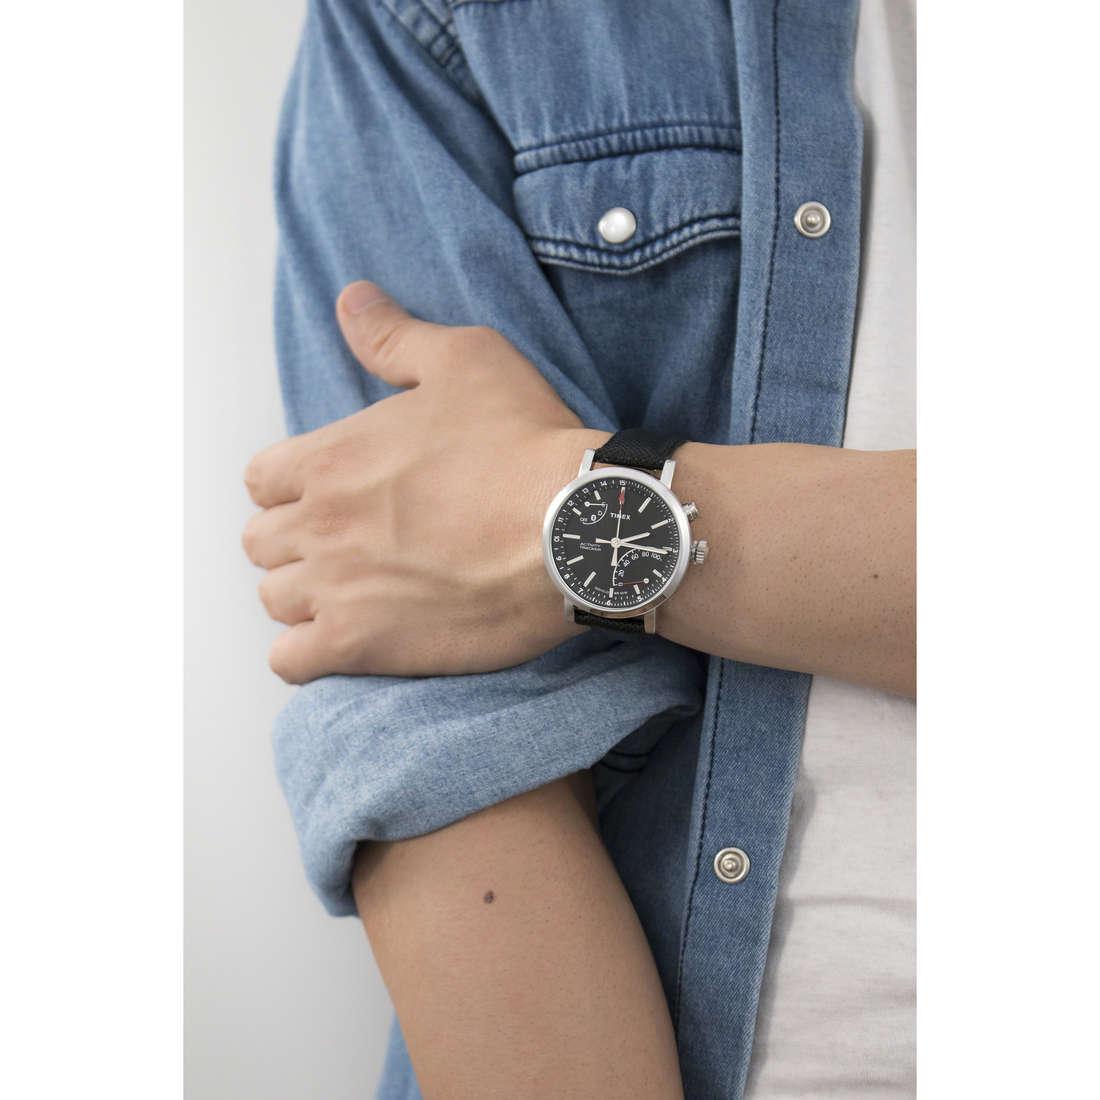 Timex multifunzione Iq Metropolitan uomo TW2P81700 indosso